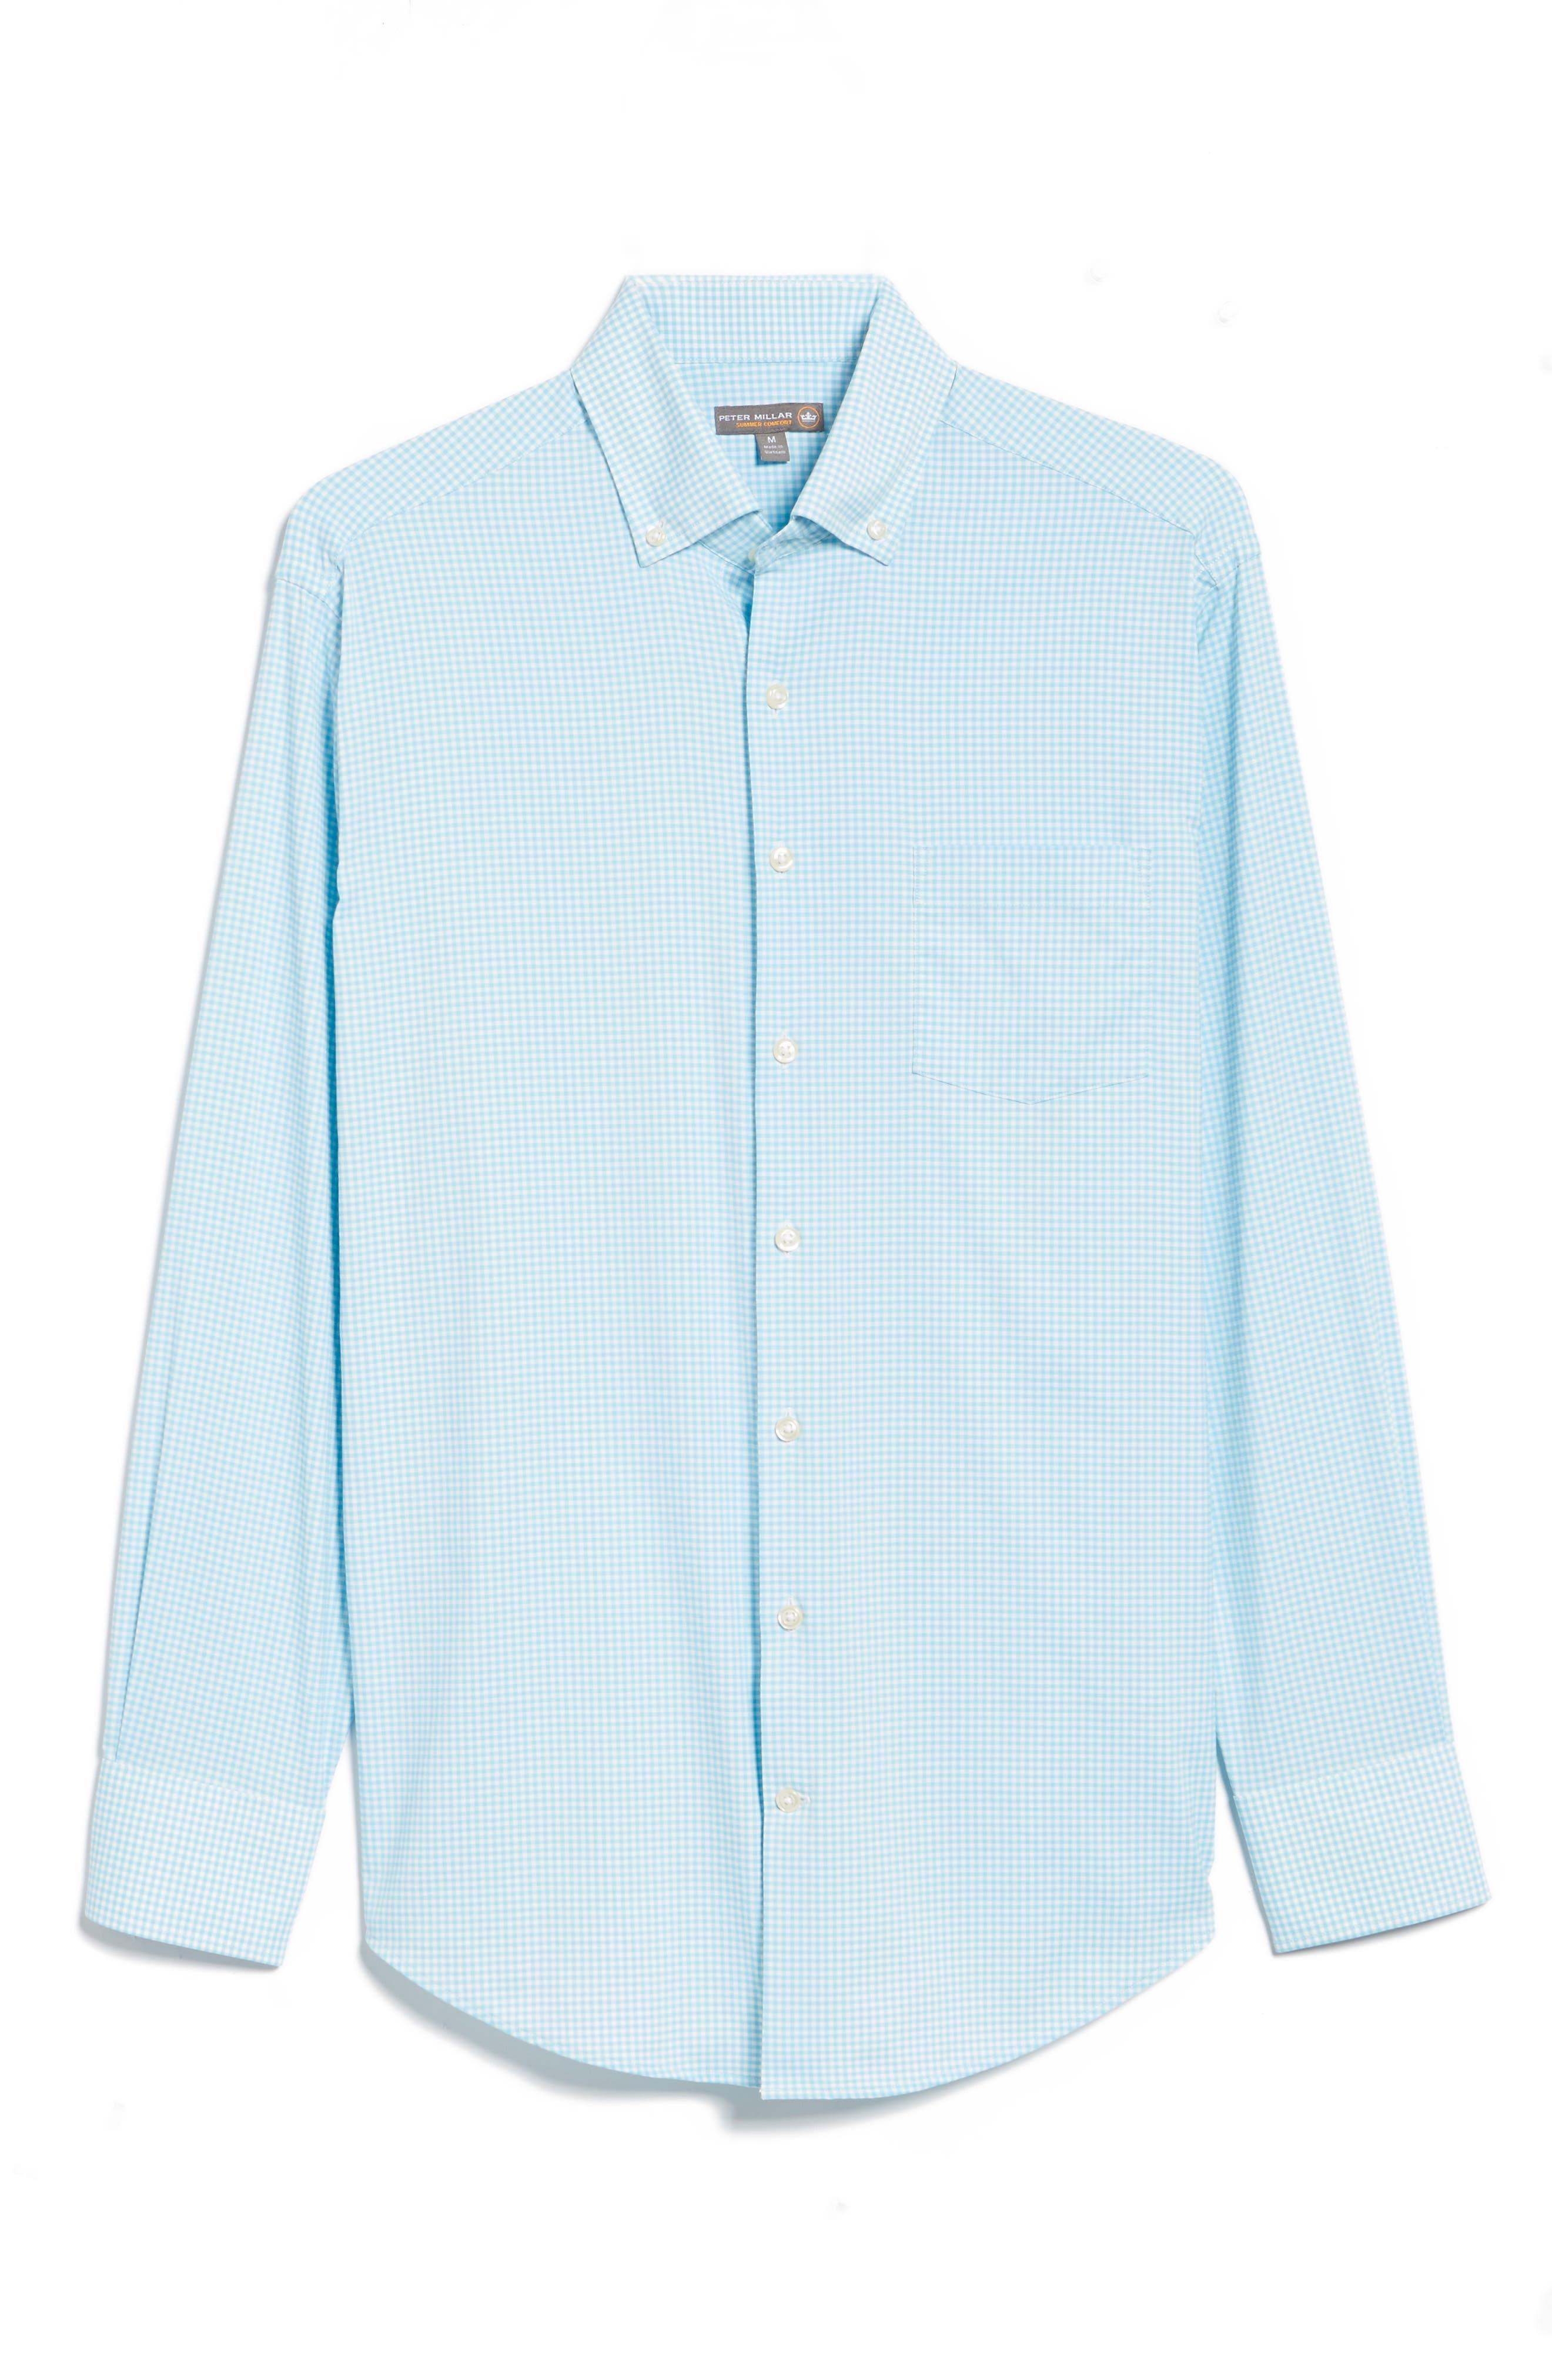 Mimi Regular Fit Check Performance Sport Shirt,                             Alternate thumbnail 6, color,                             Grotto Blue/ White